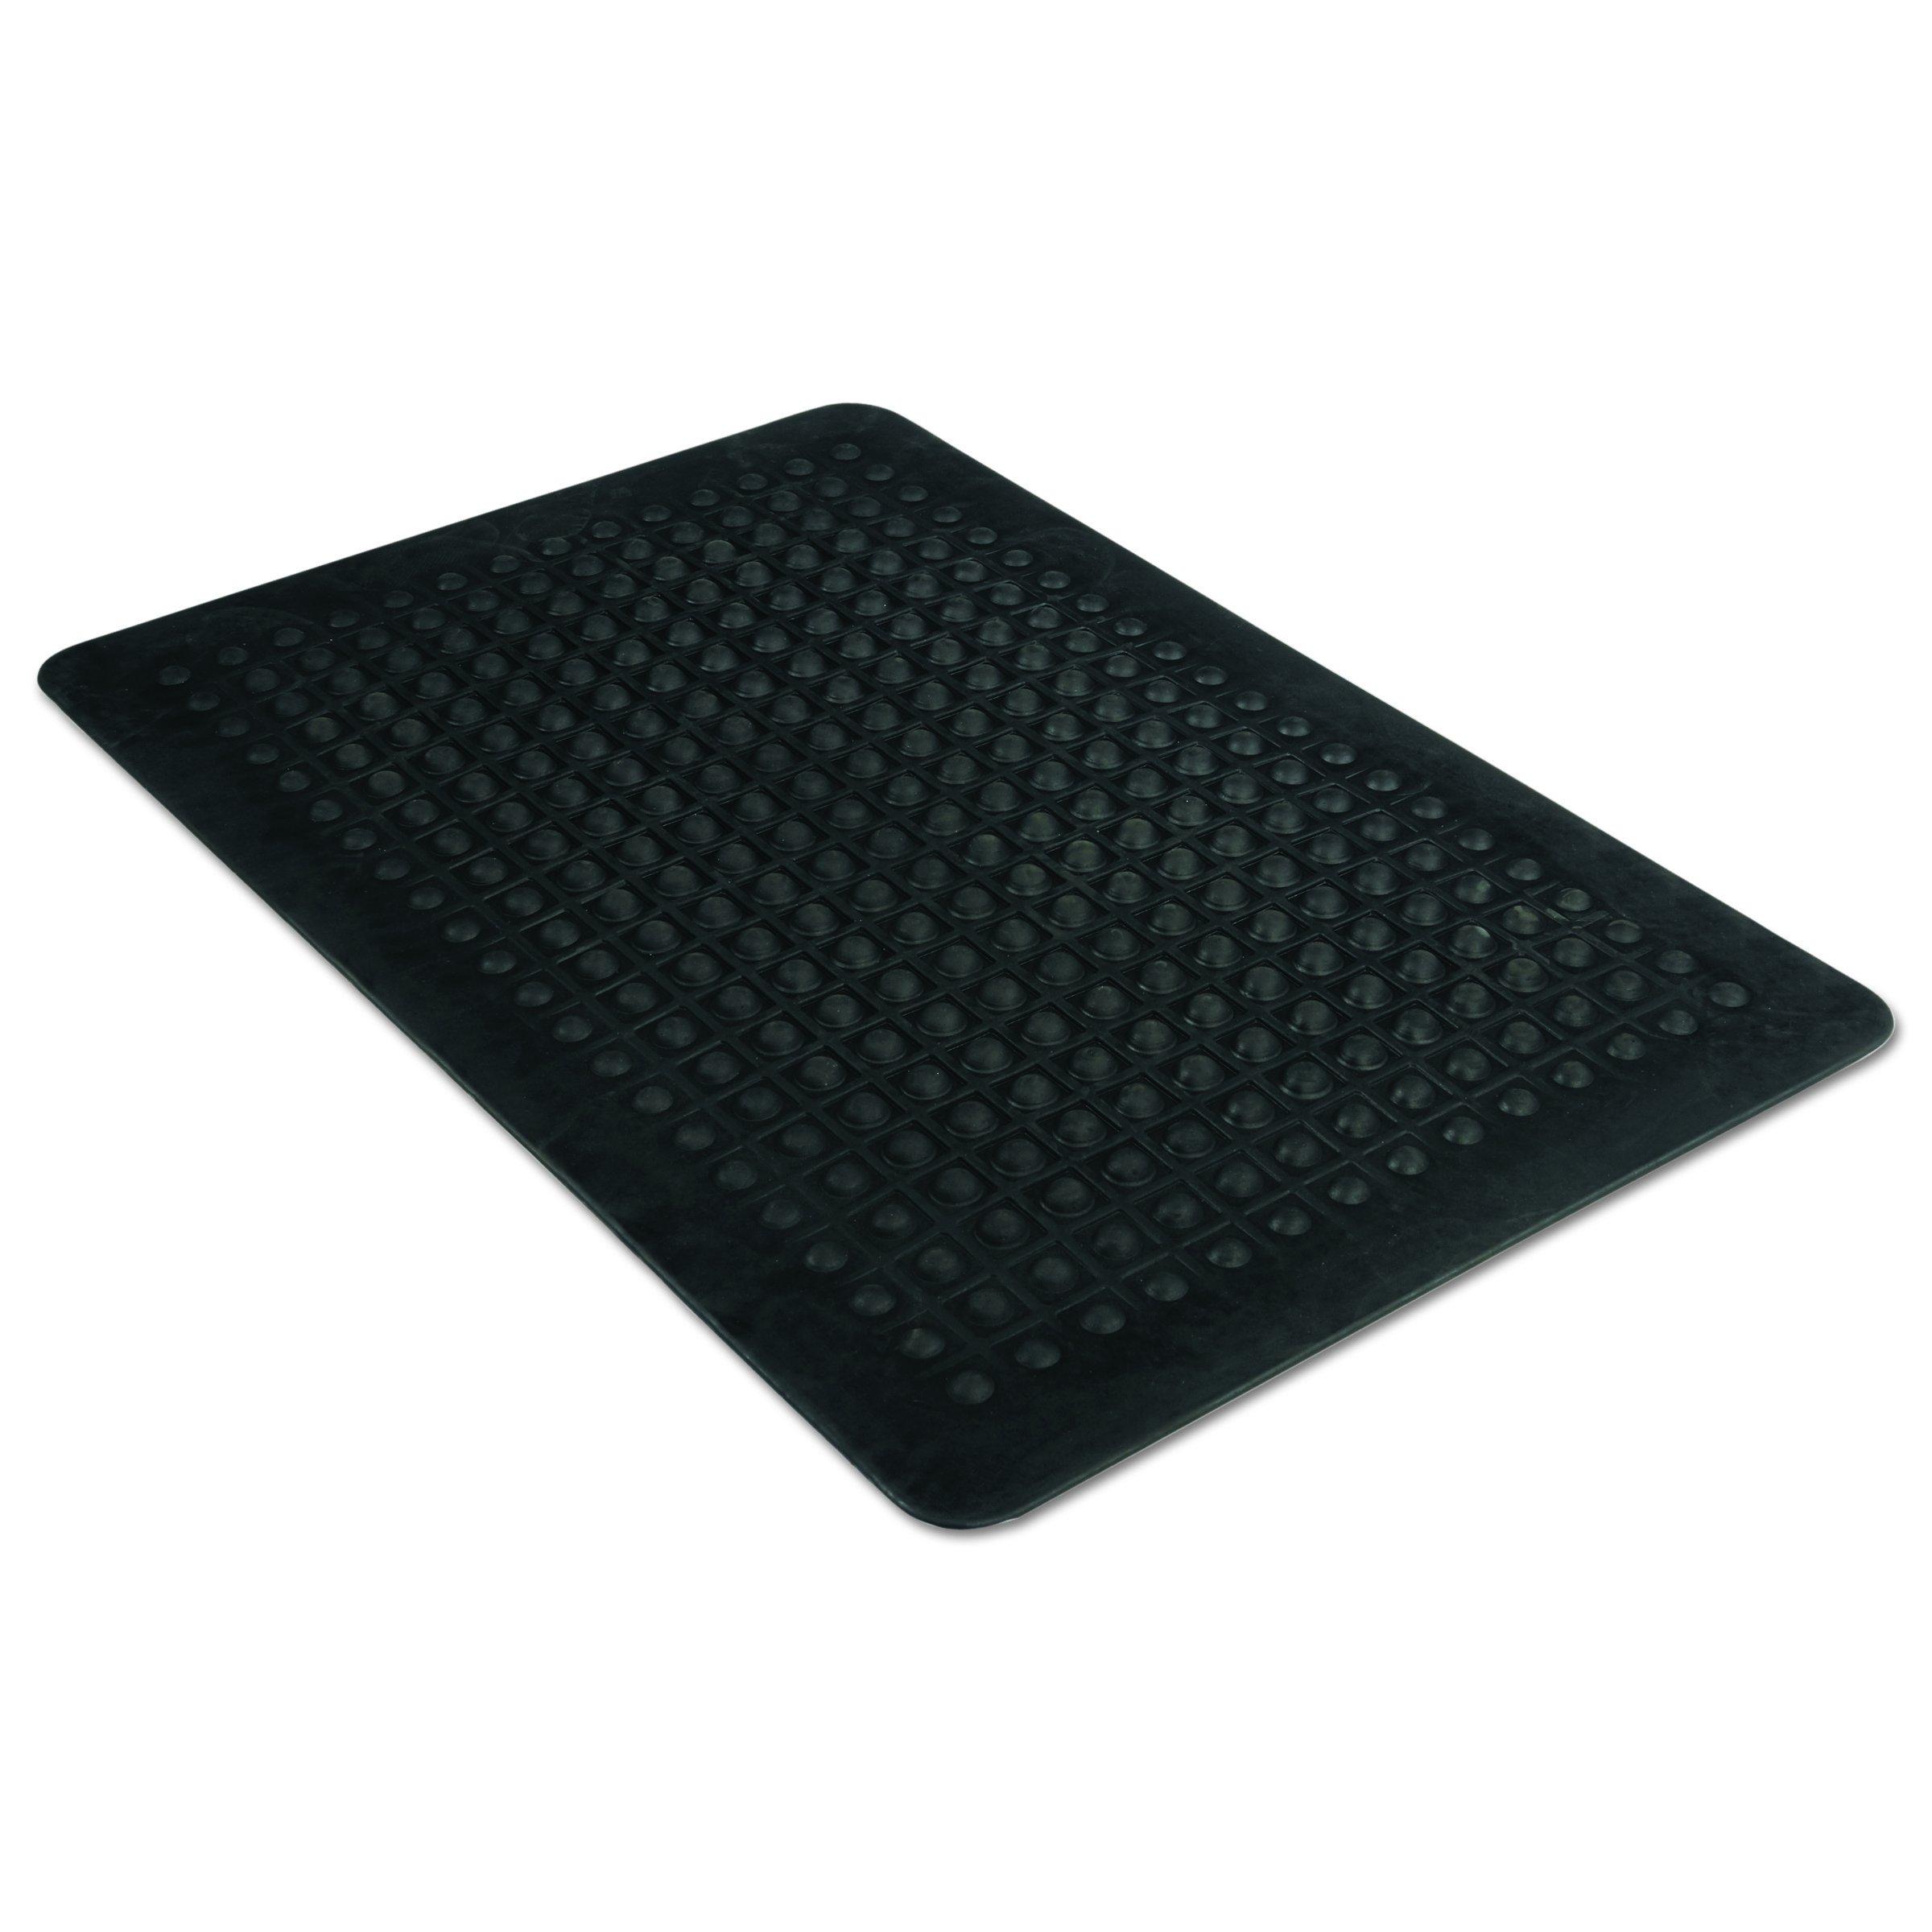 Guardian Flex Step Antifatigue Floor Mat, Rubber, 3'x5', Black by Guardian